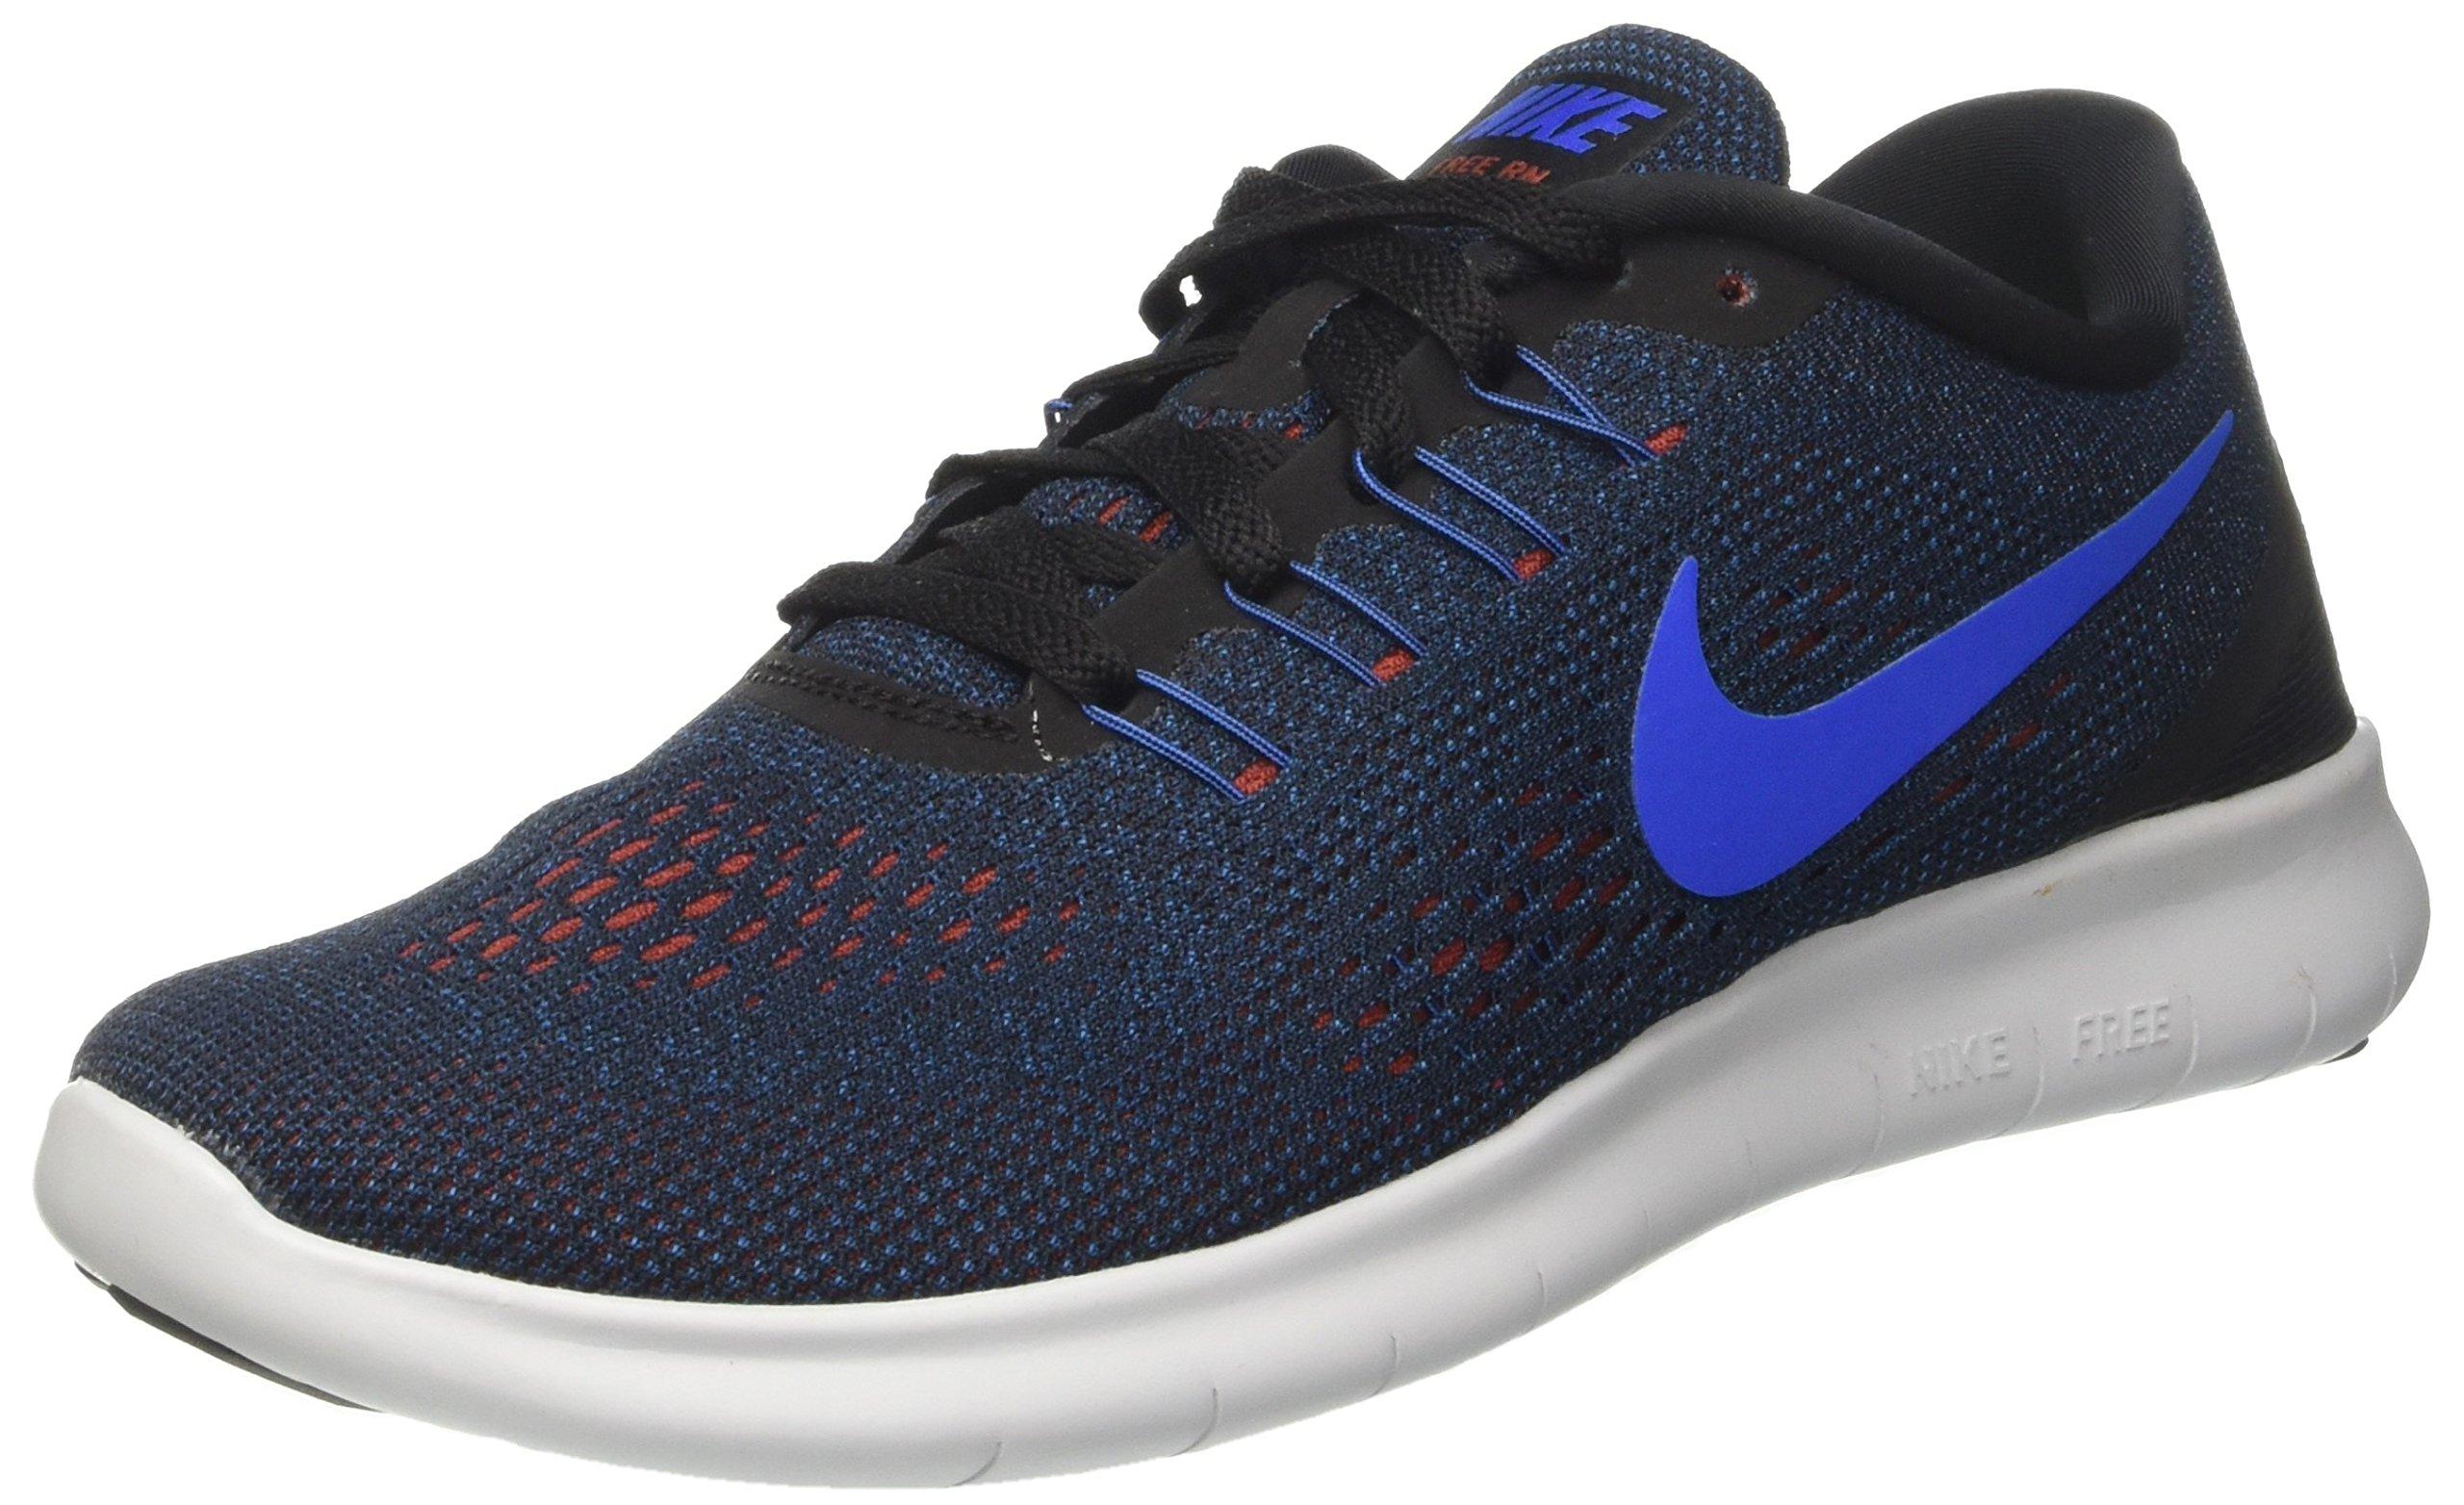 Nike Free RN Black/Soar/Dark Cayenne/Team Royal Mens Running Shoes by NIKE